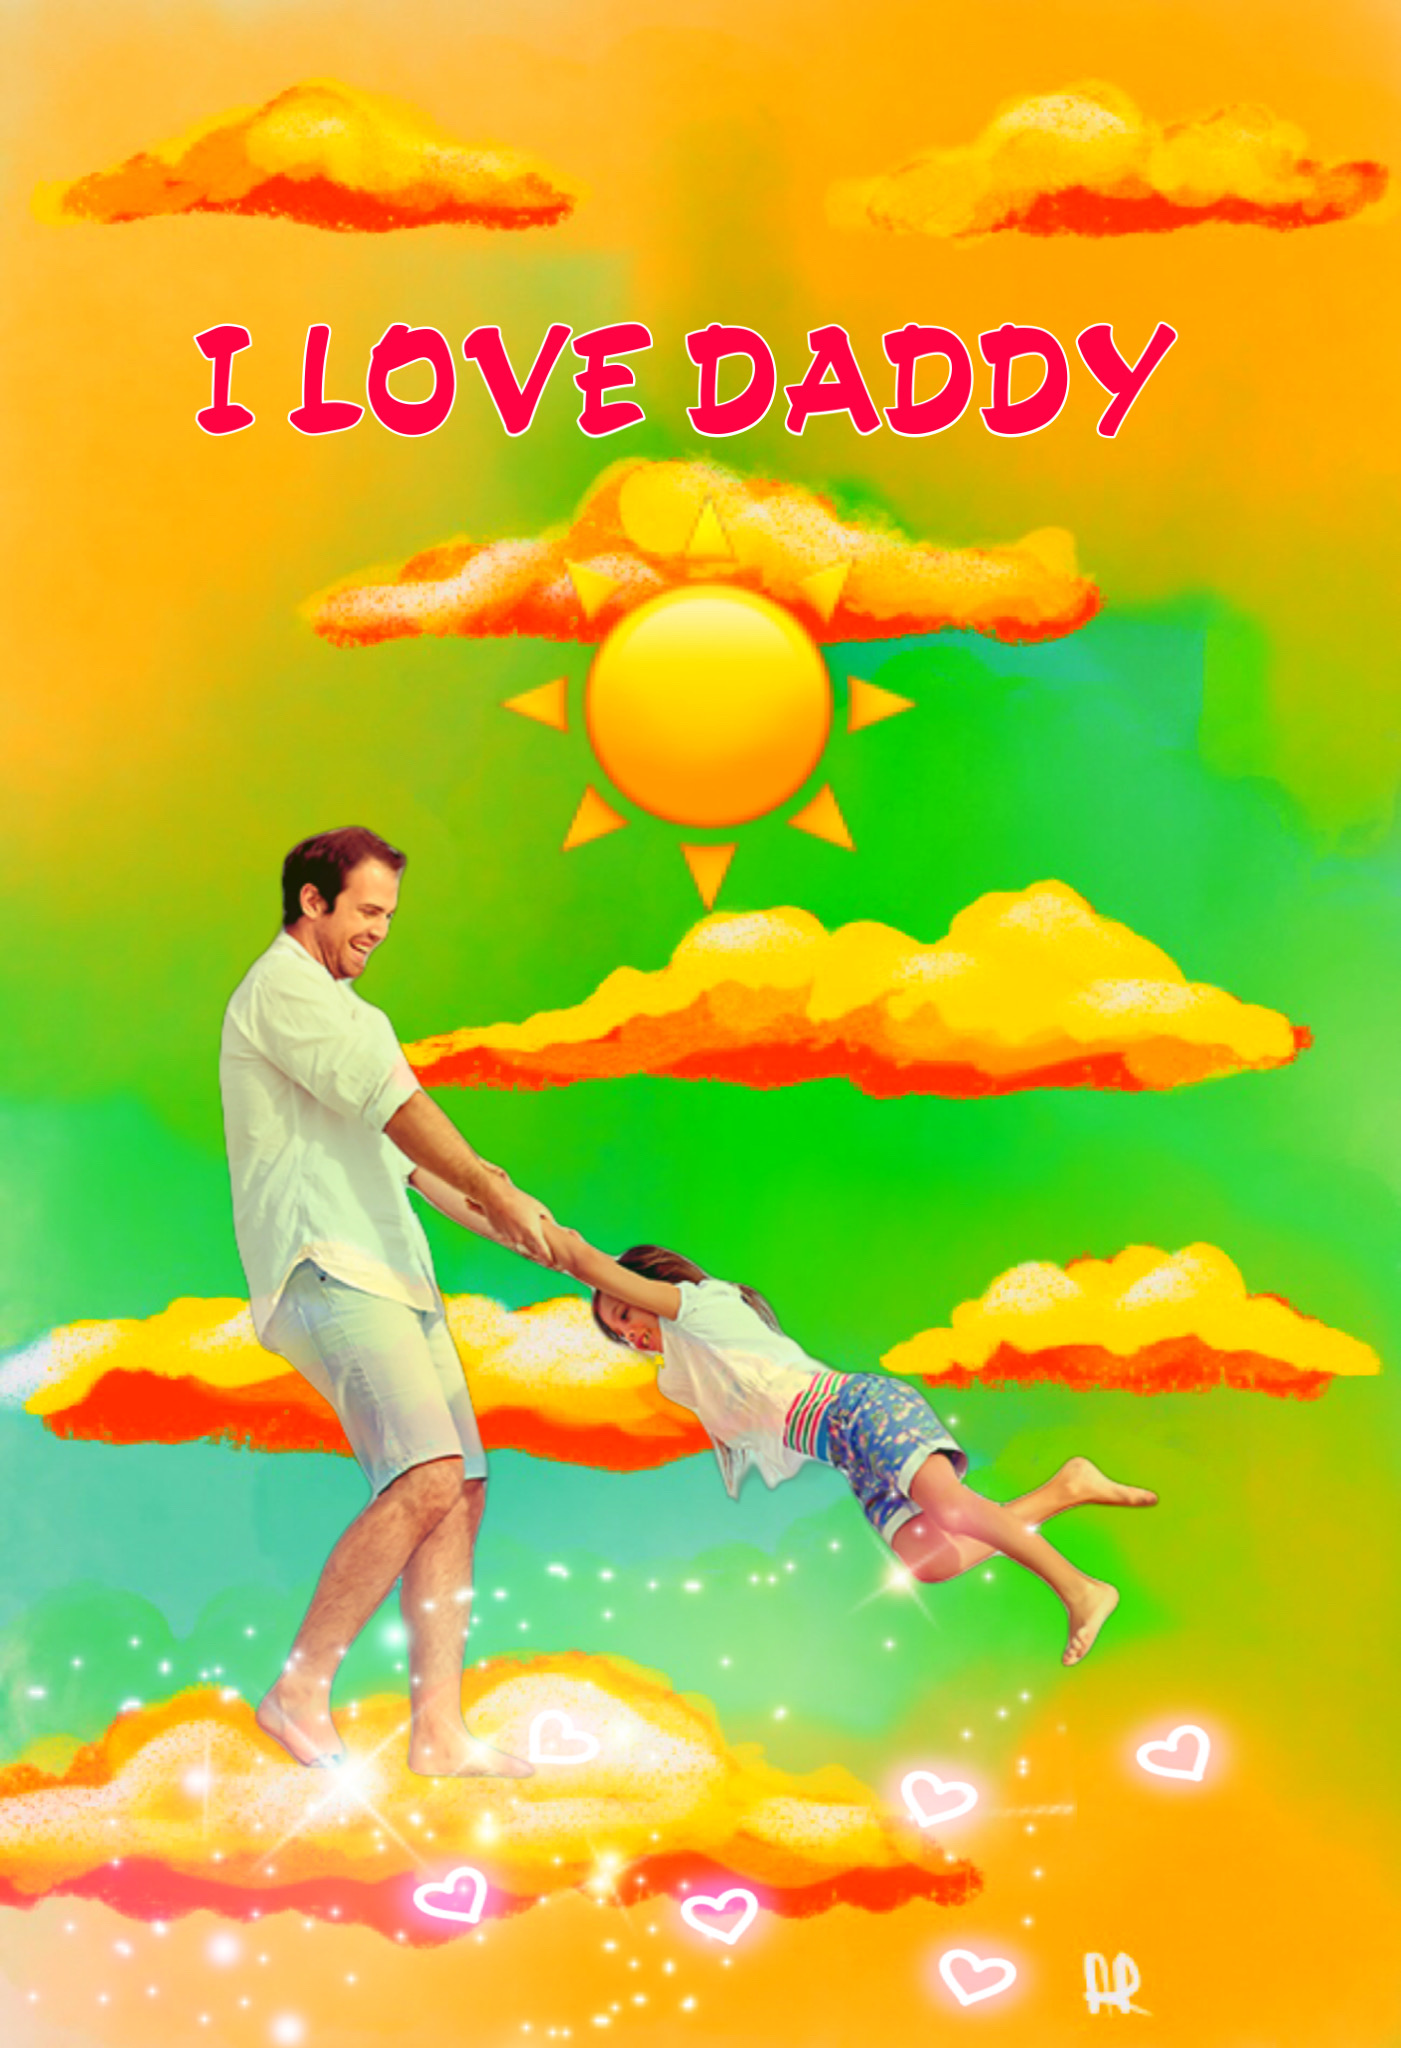 Father's Day #freetoedit #picsart #fathersday #drawing #remix